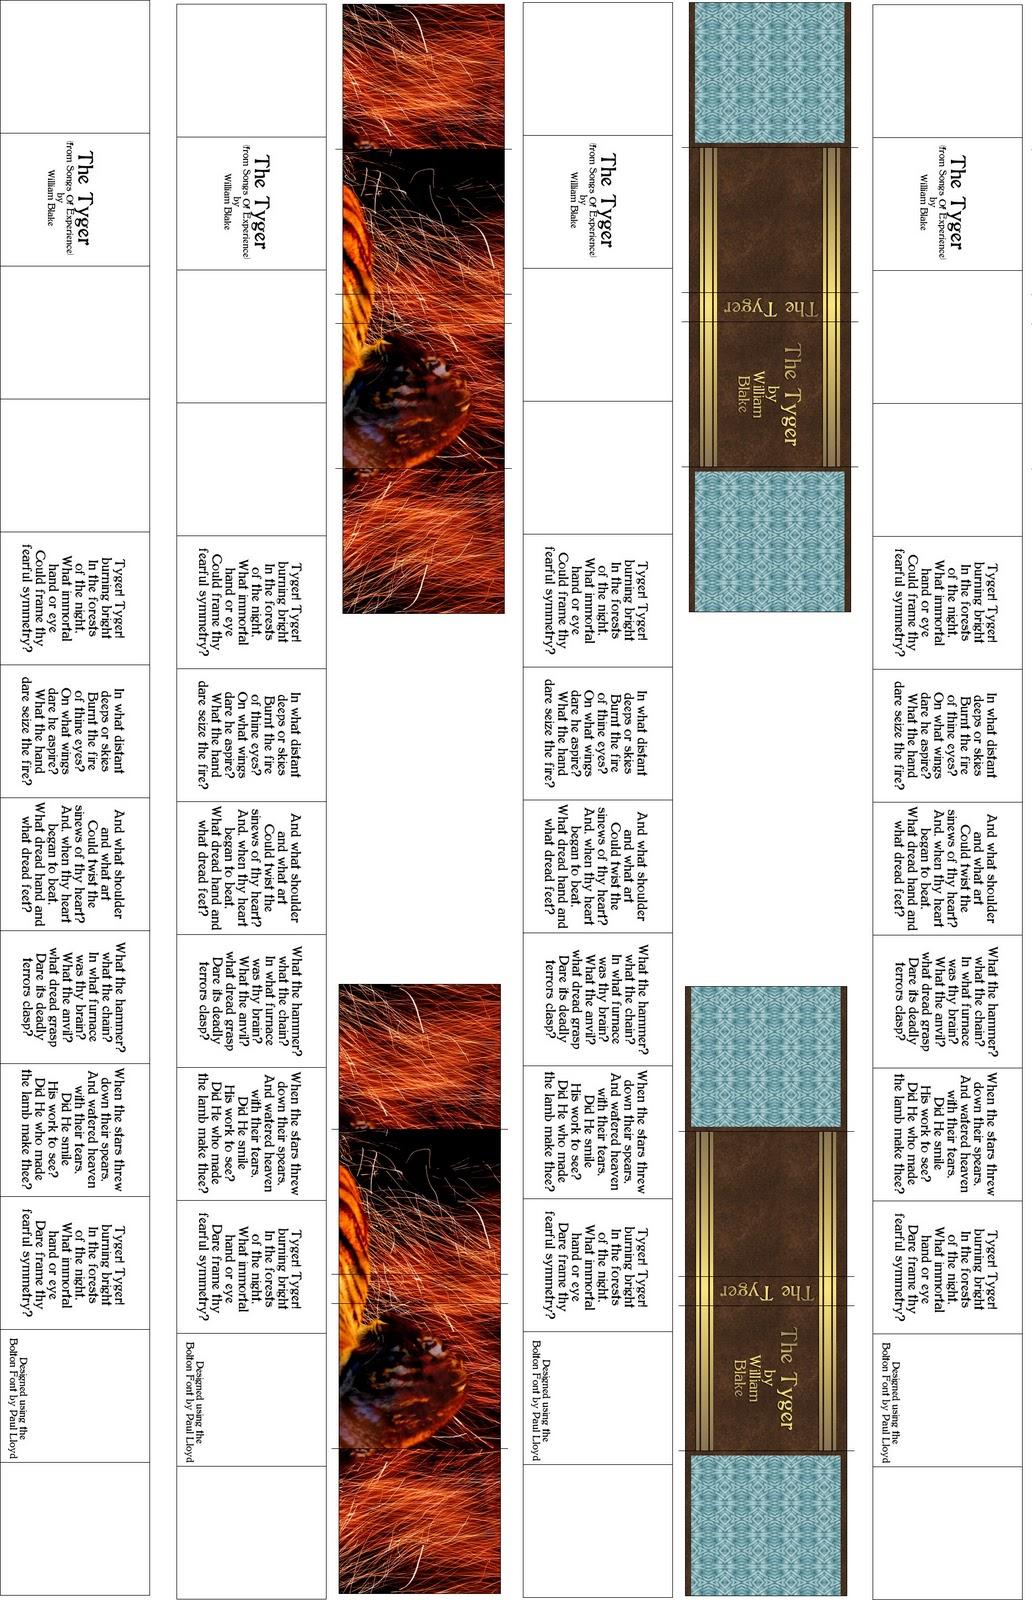 photo regarding Miniature Books Printable referred to as Dont Try to eat the Paste: Tyger printable miniature e book